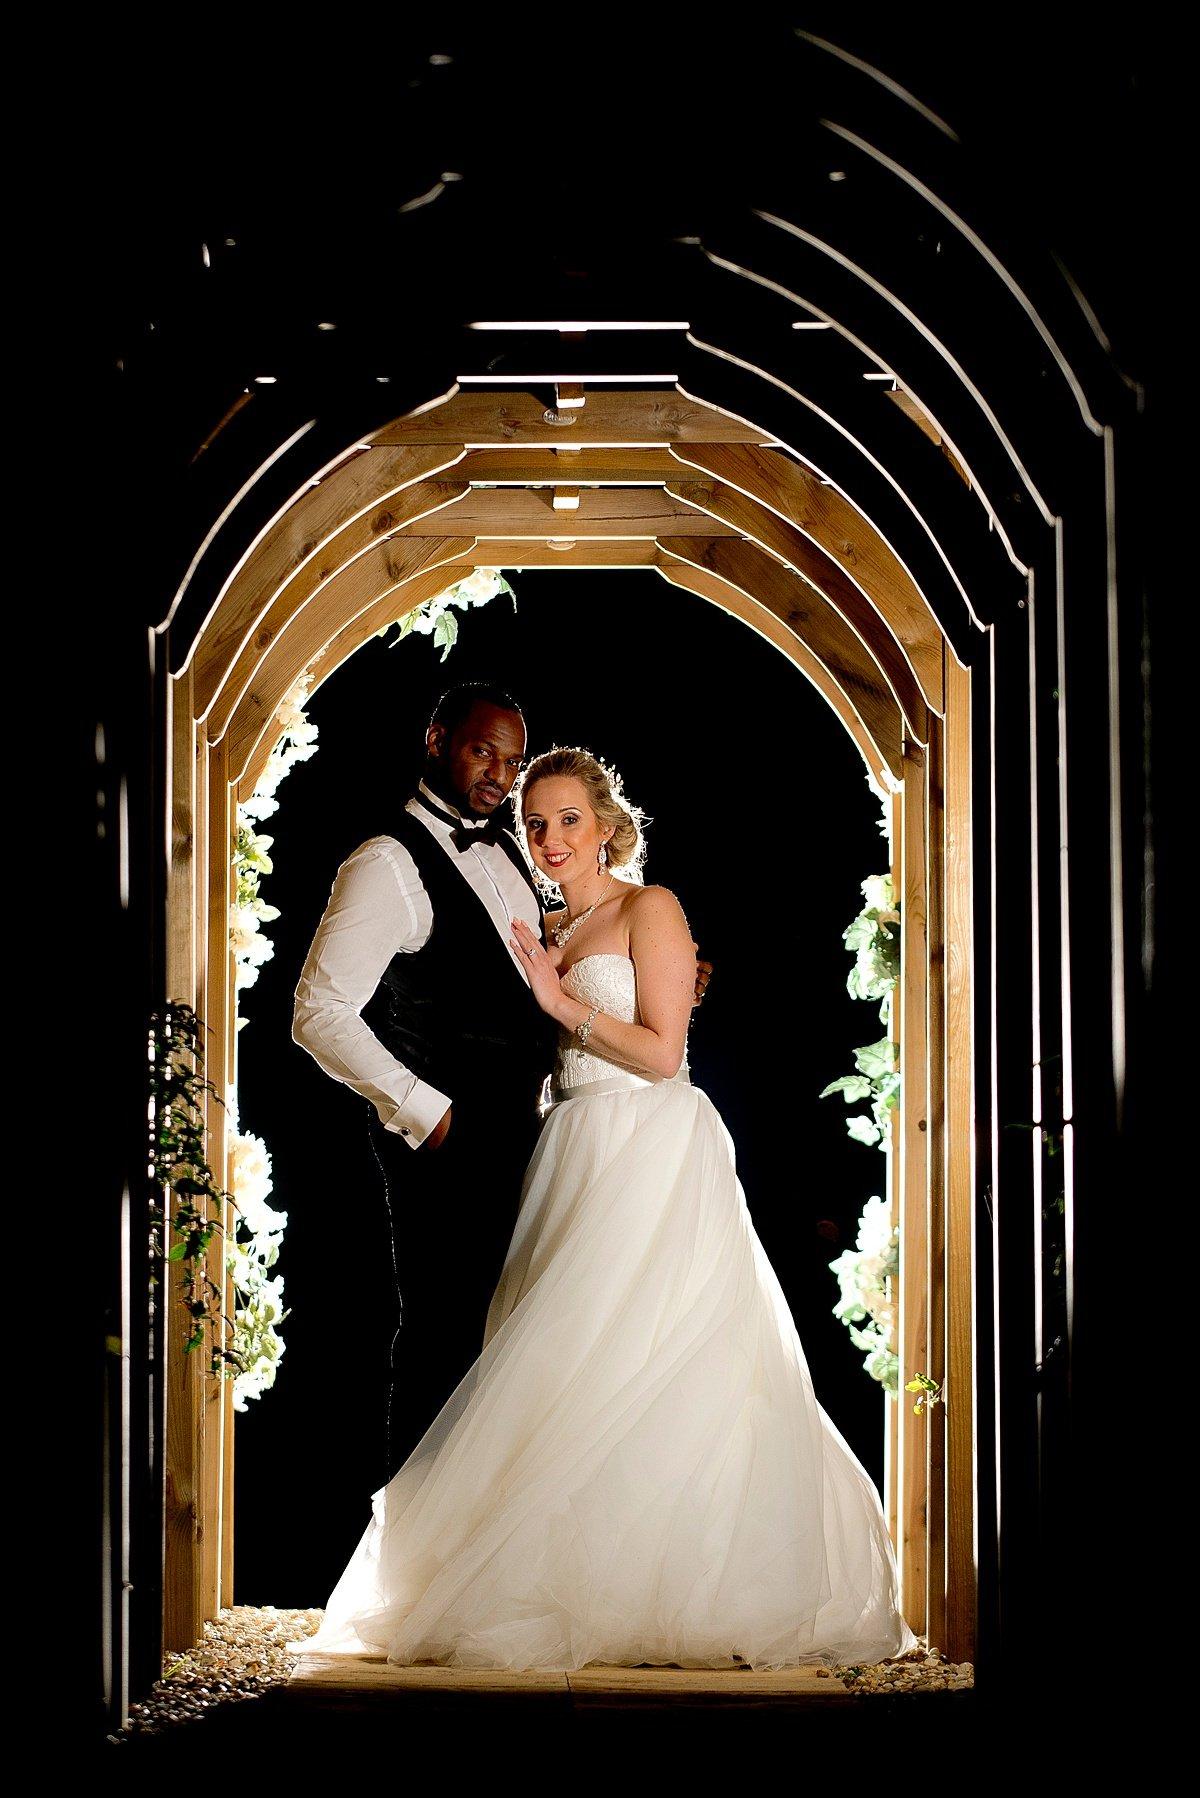 Swancar Farm Bride and groom portrait